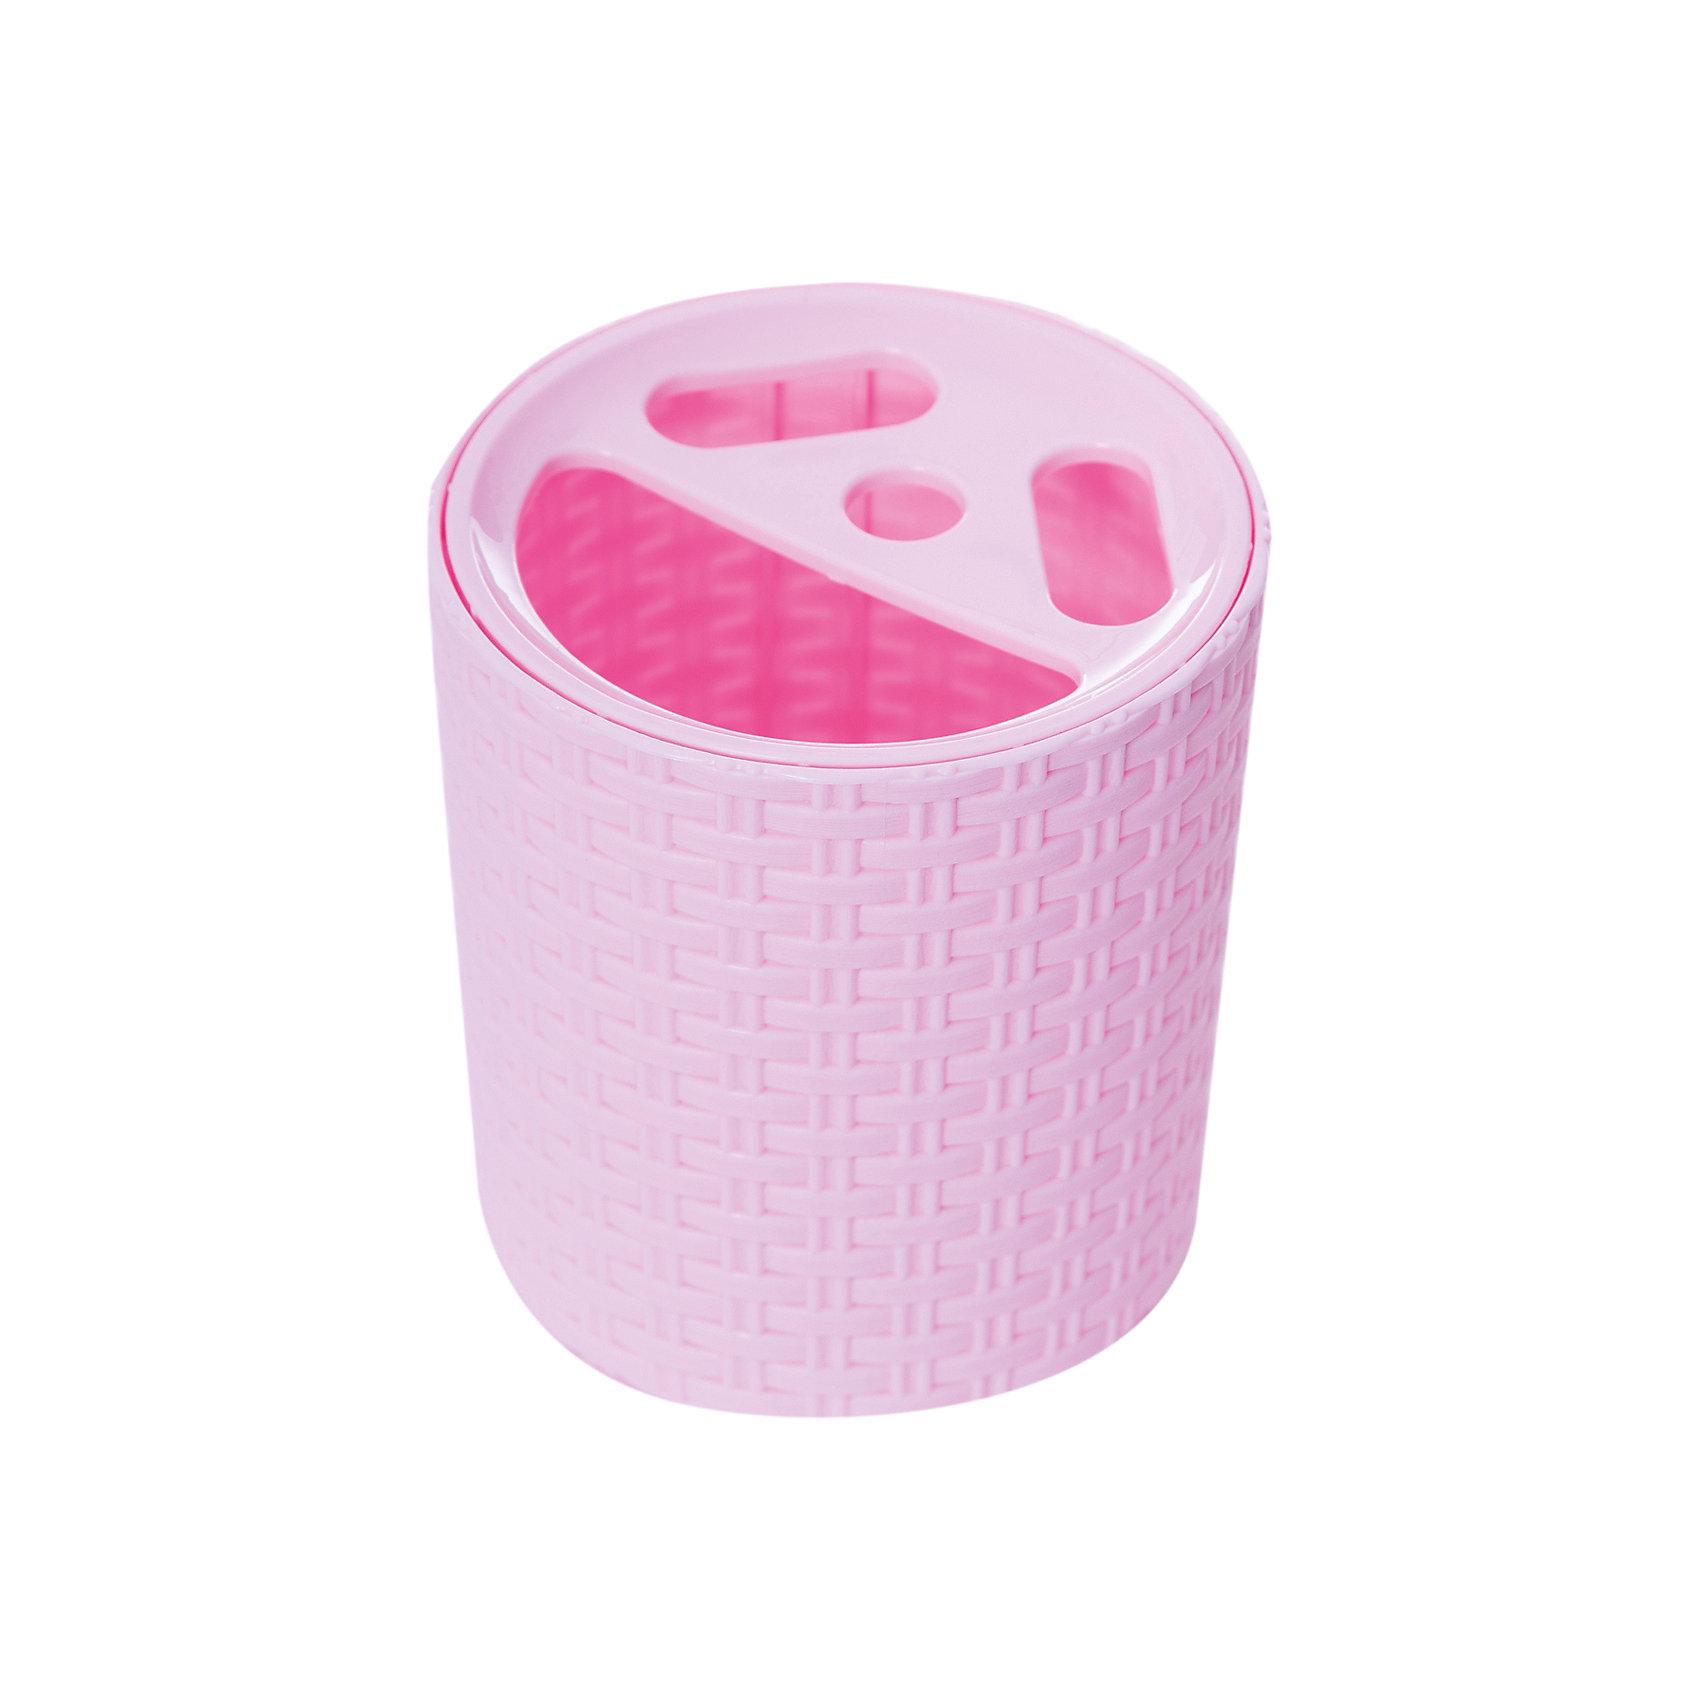 Alternativa Подставка Плетёнка для зубных щёток , Alternativa, розовый стаканчик для зубных щеток wasserkraft wern 7528 9060516